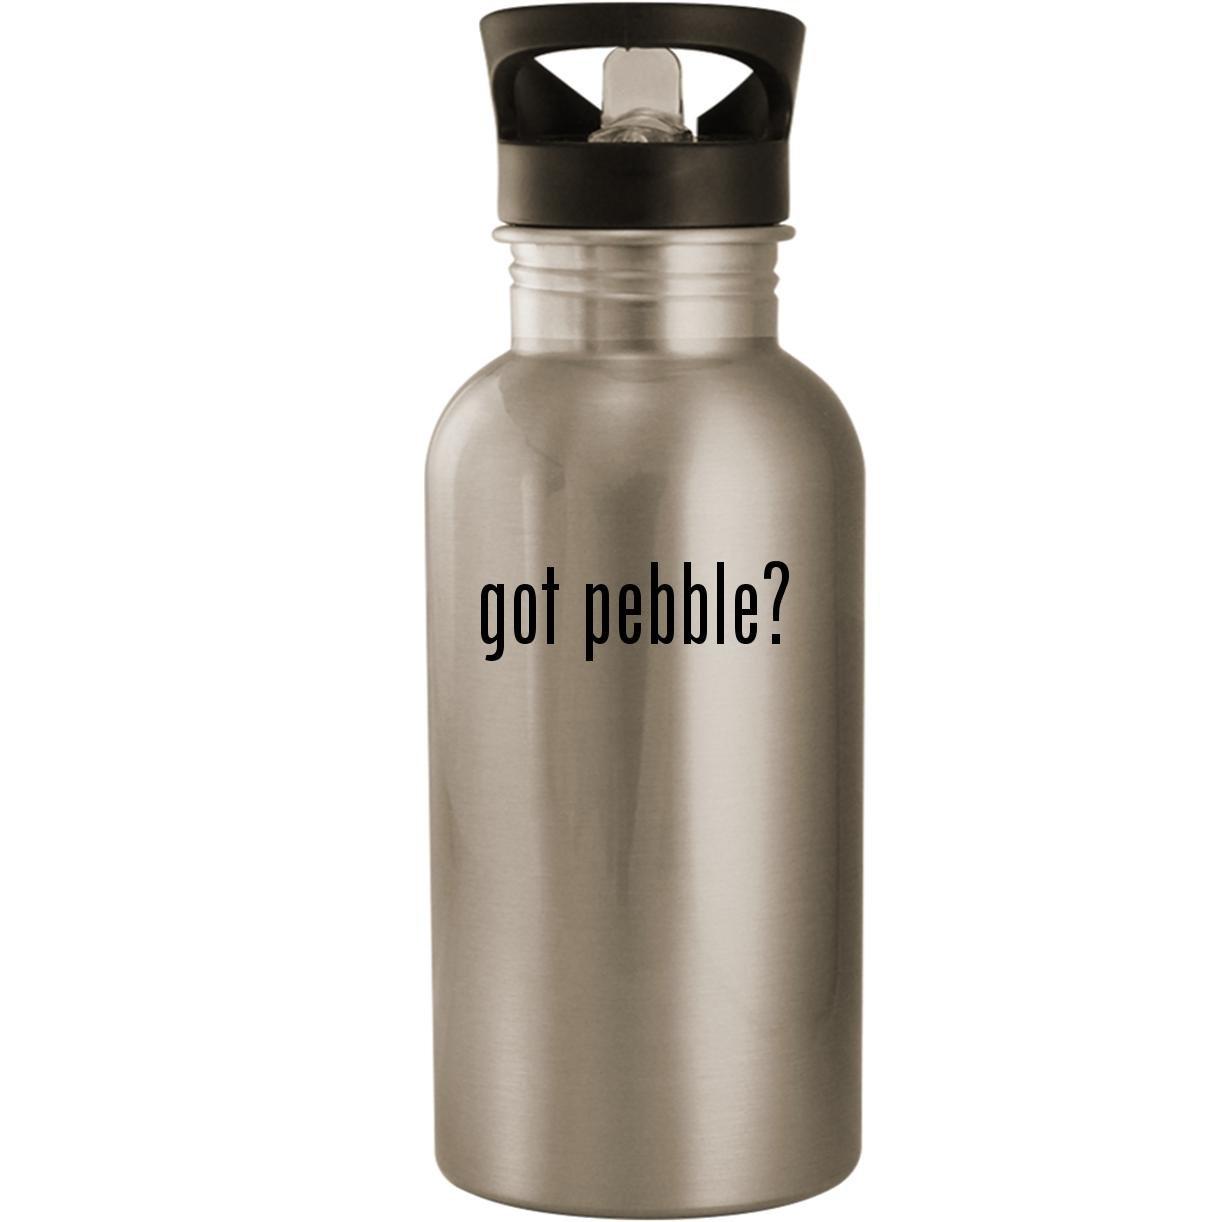 Got Pebble  – ステンレススチール20oz Road Ready水ボトル シルバー US-C-07-18-01-041443-04-26-18-26 B07FMD9PXB シルバー